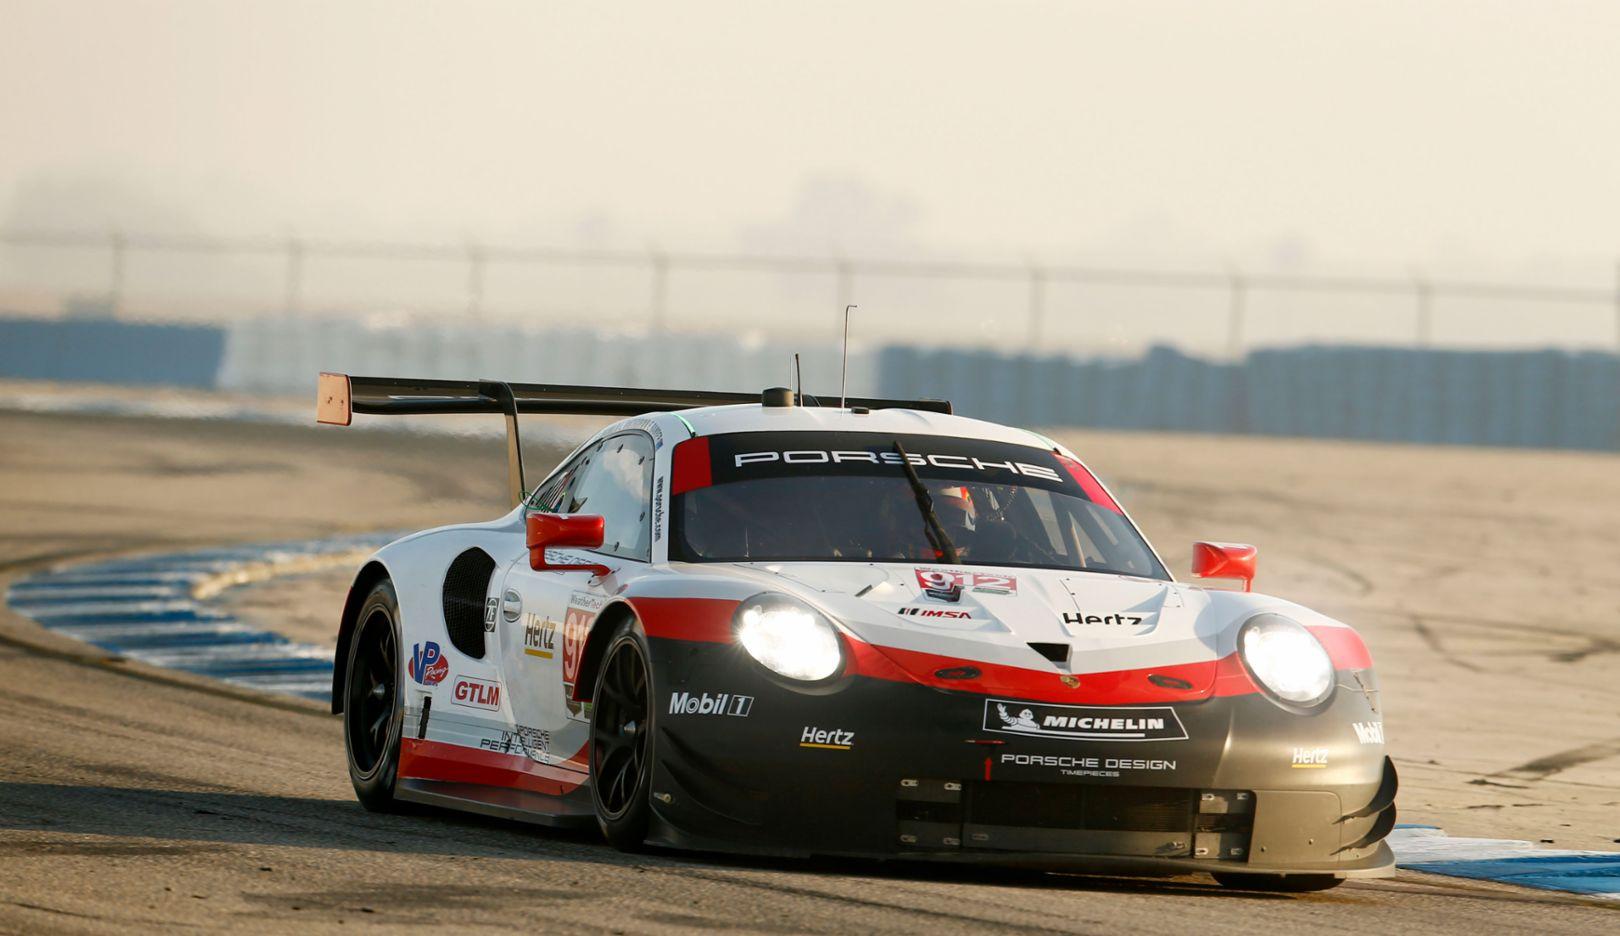 911 RSR, IMSA WeatherTech SportsCar Championship, round 2, 12 Hours of Sebring, USA, 2018, Porsche AG